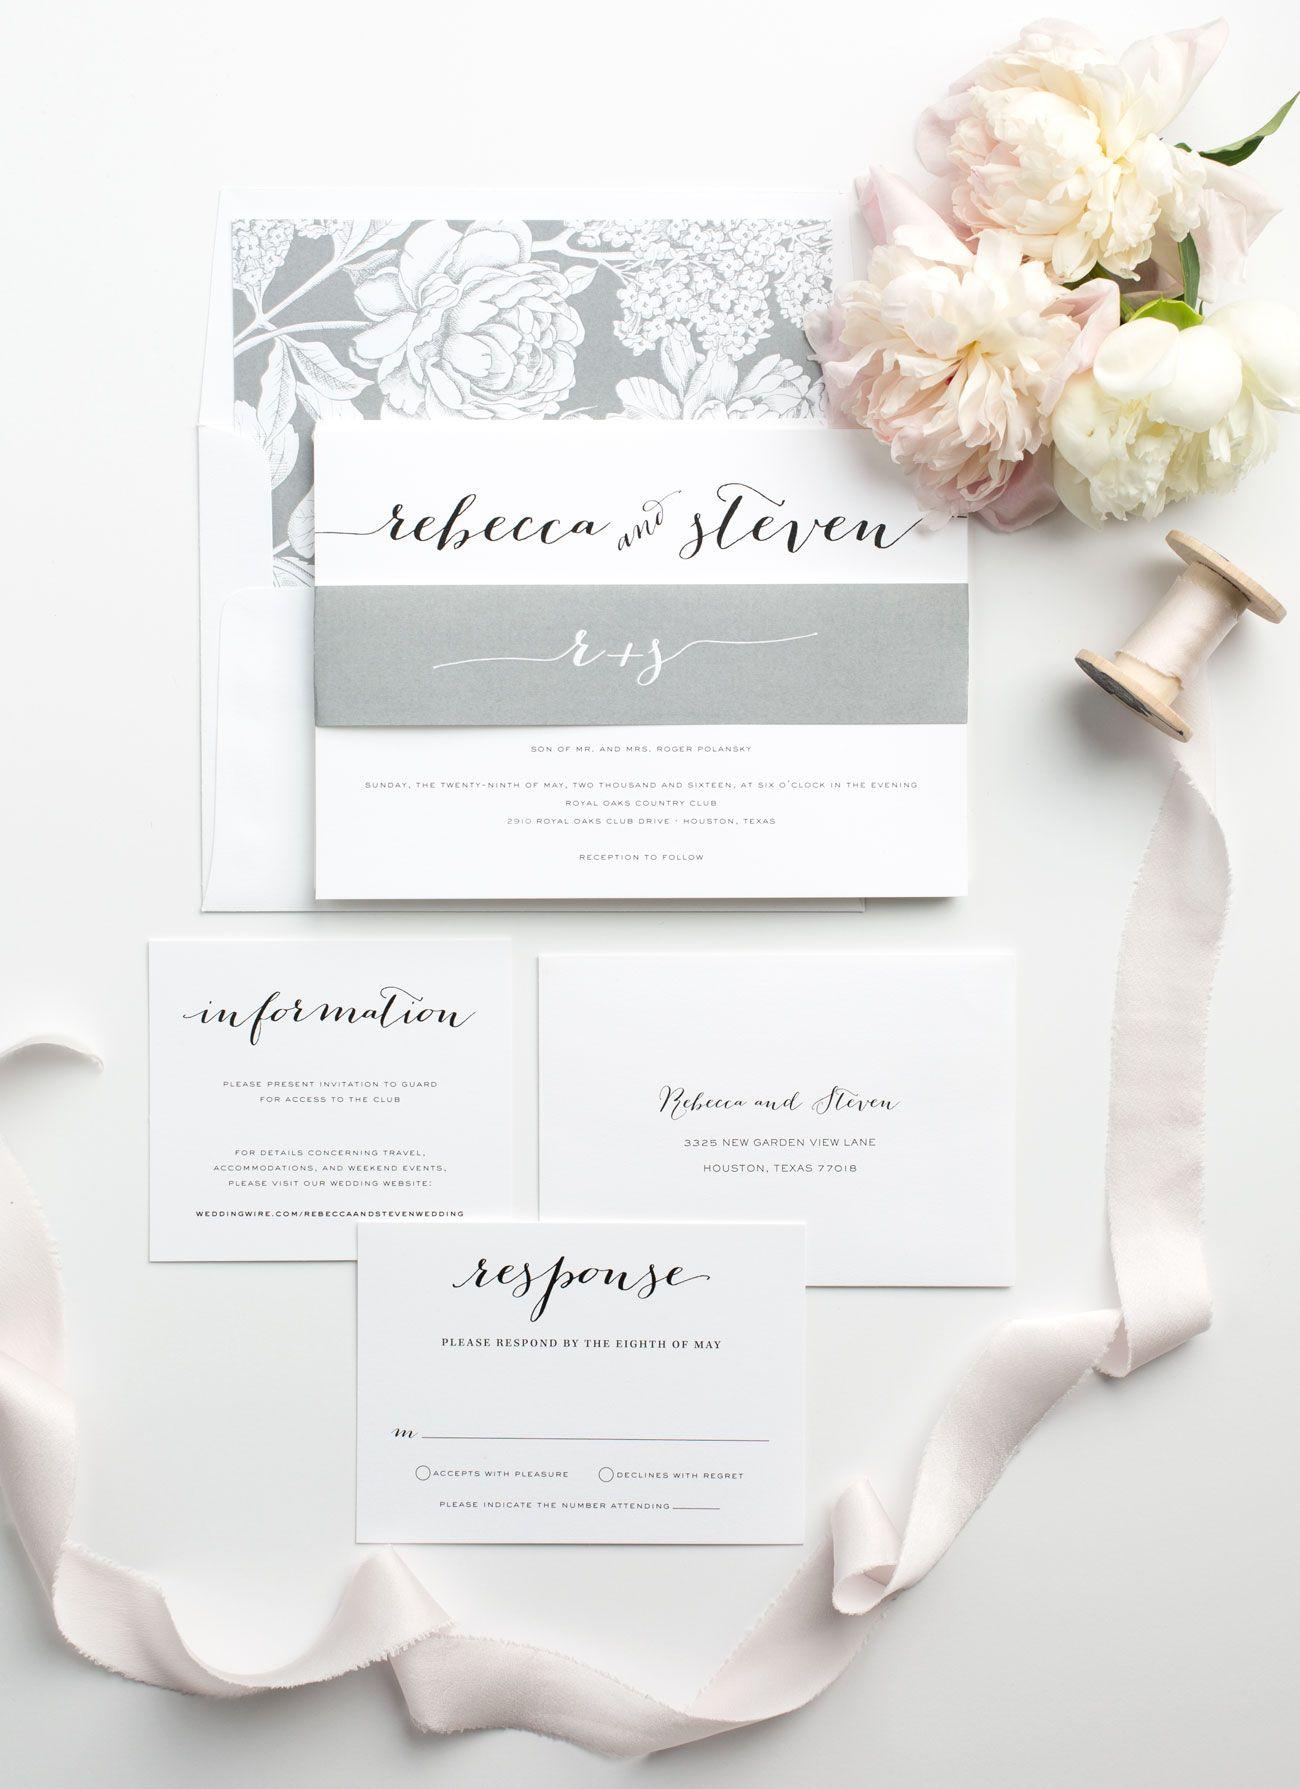 Script Wedding Invitations in Gray | Modern calligraphy, Shine ...